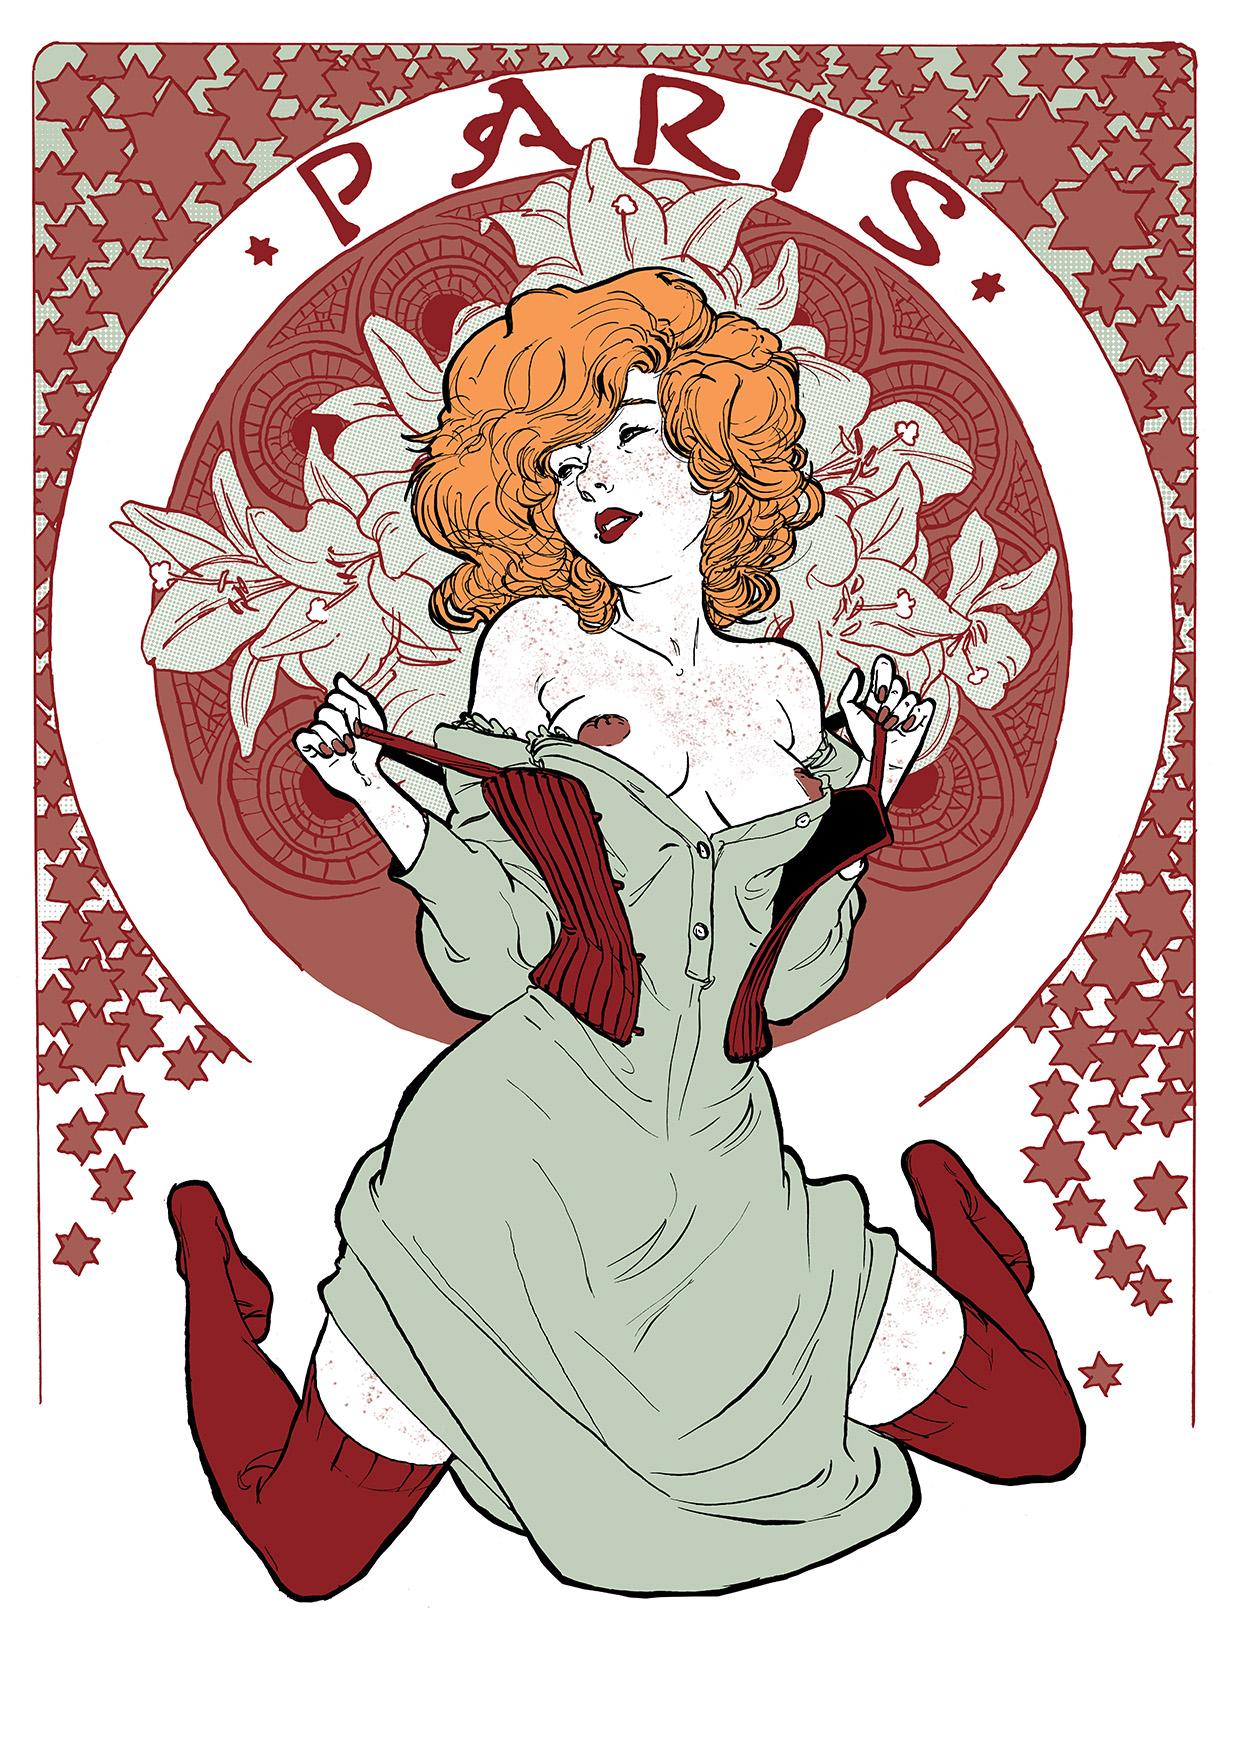 yannick corboz illustration 9